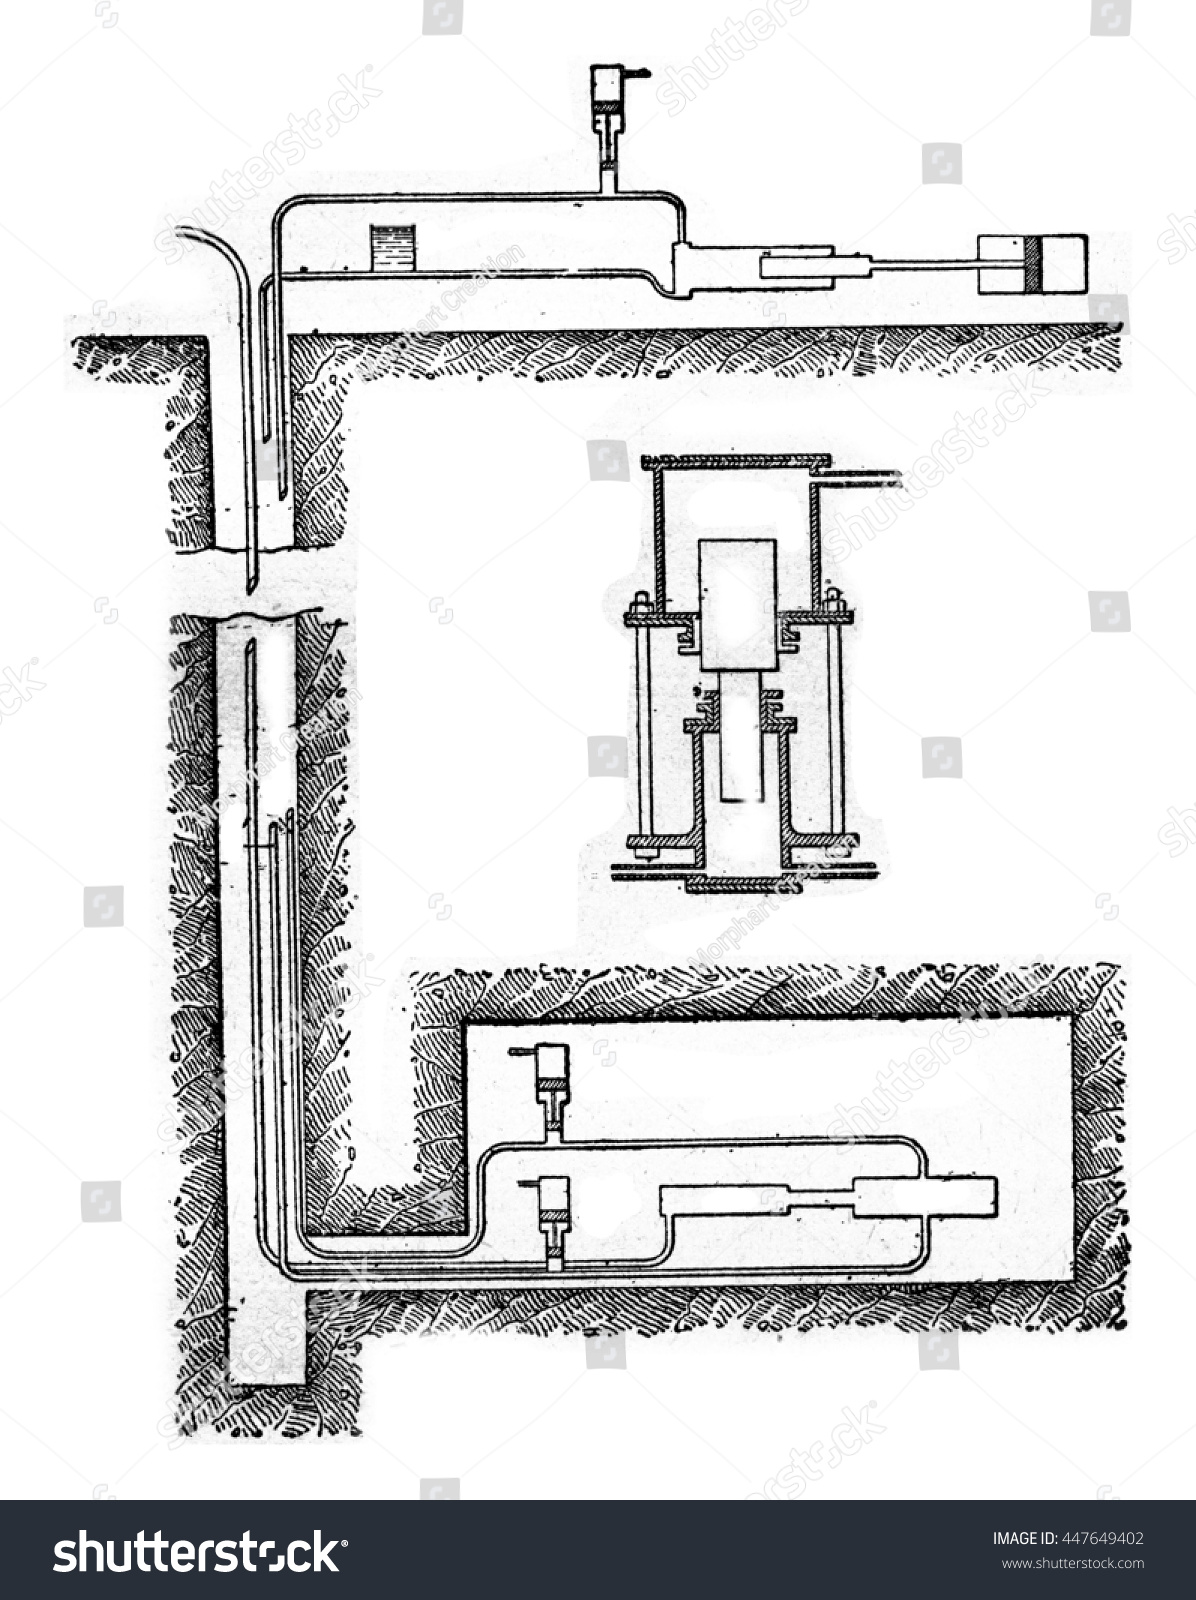 diagram of hydraulic transmission pump, vintage engraved illustration   industrial encyclopedia e -o  lami - 1875